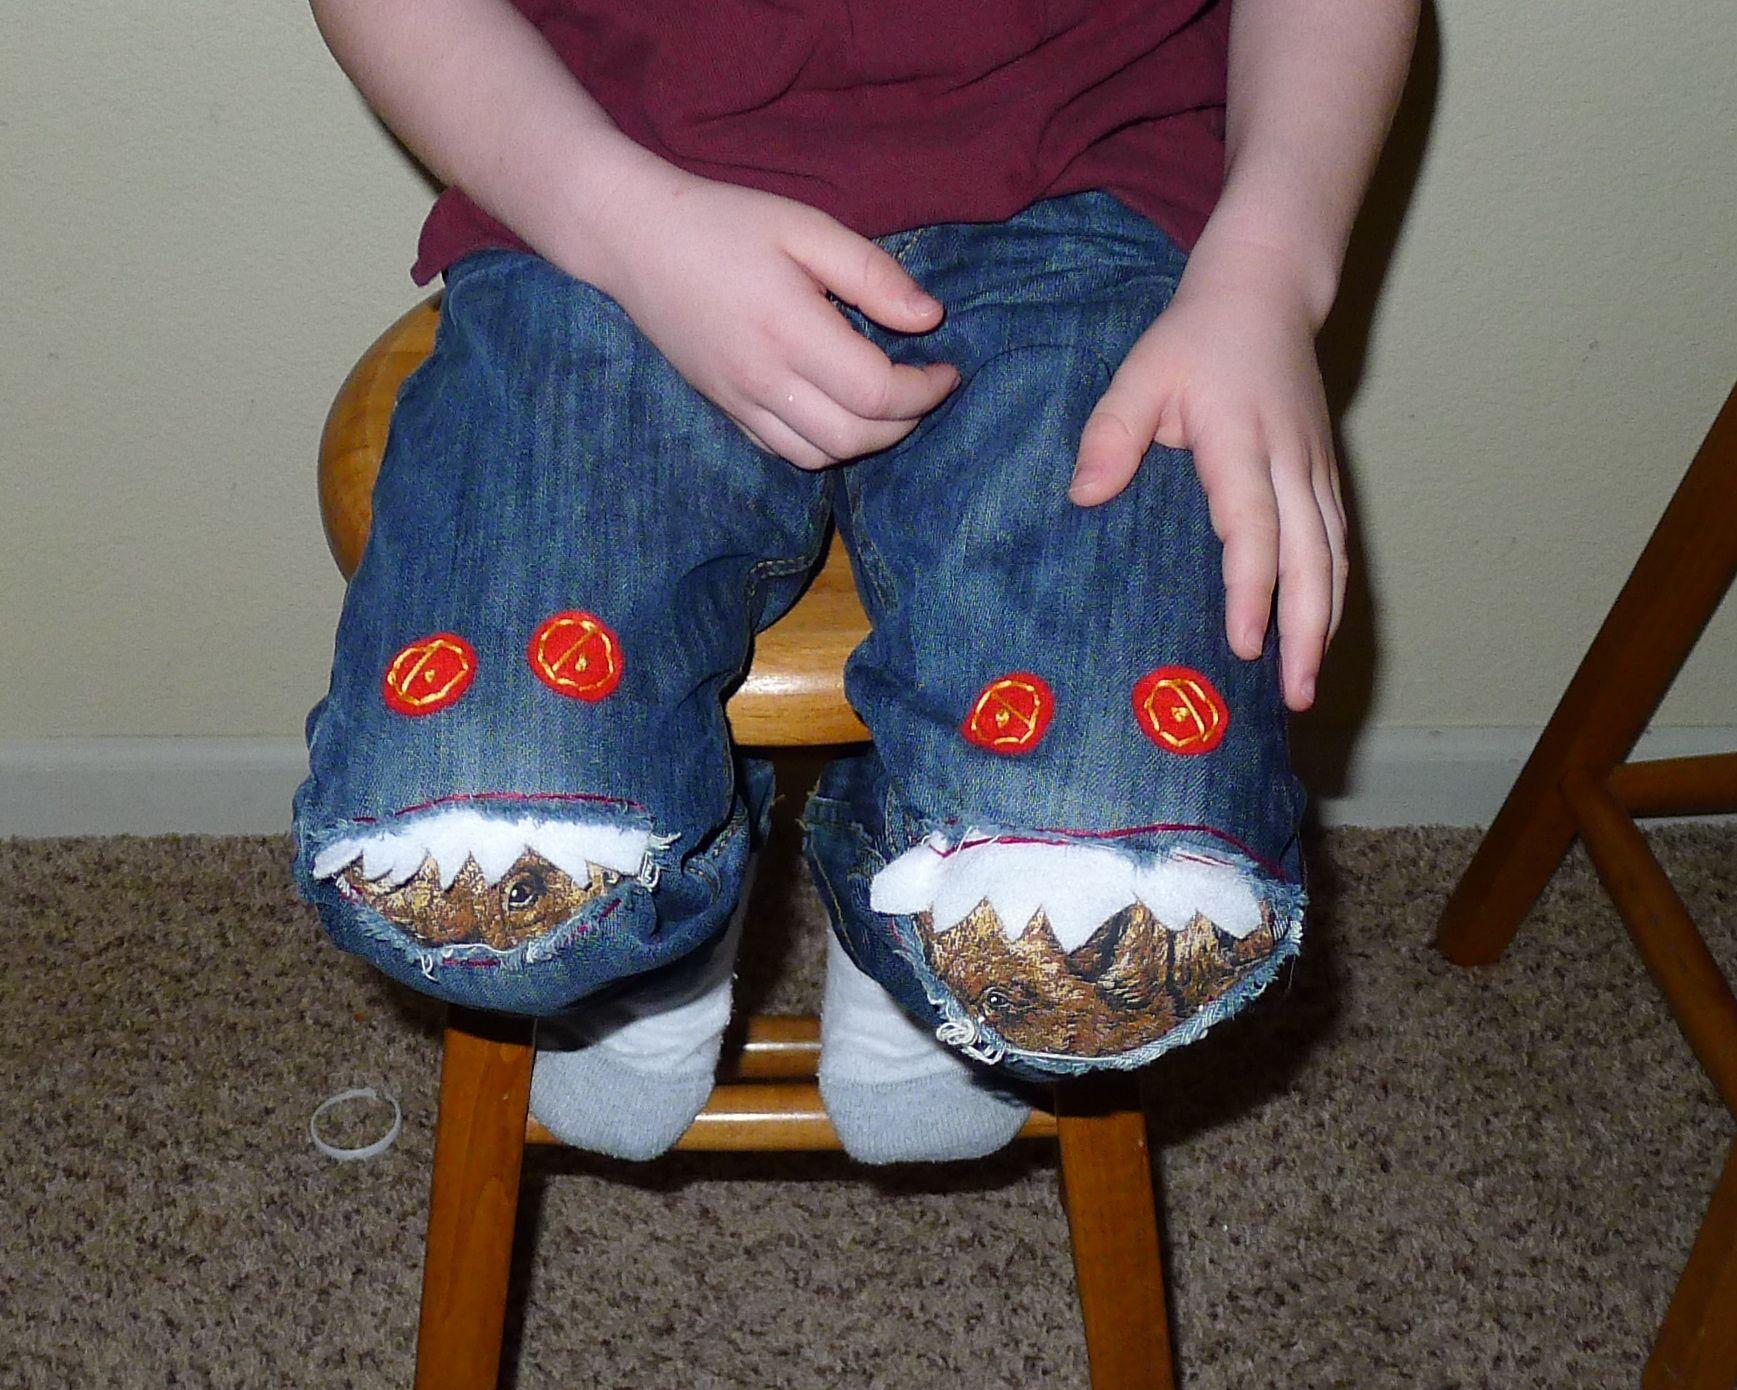 Monster Pants Sew Felt Teeth Onto Fabric Sew The Fabric